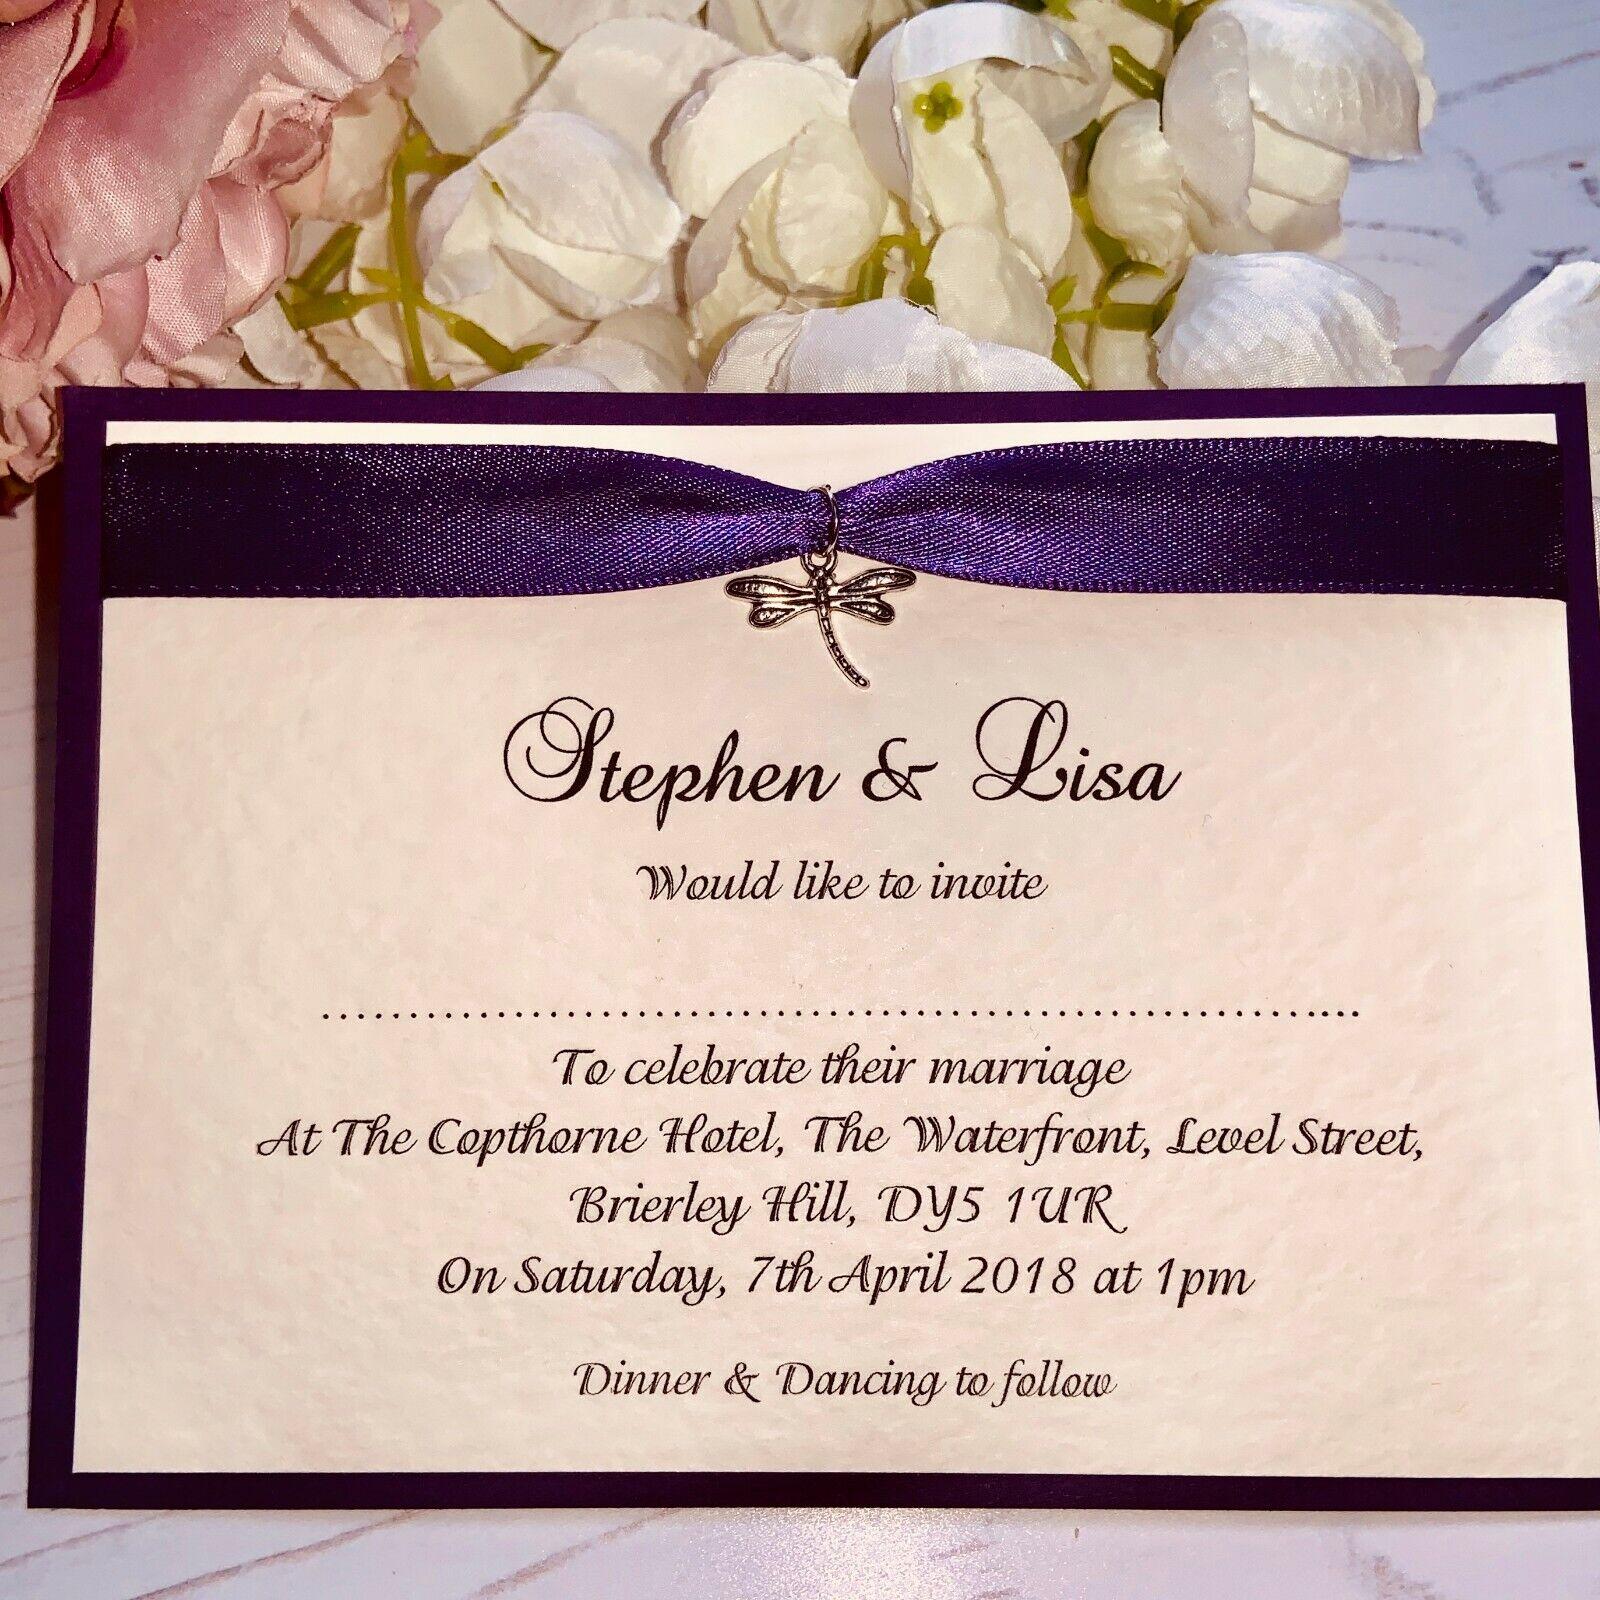 Wedding Invitations - lila Ribbon & Silber Dragonfly Charm - Pack of 50